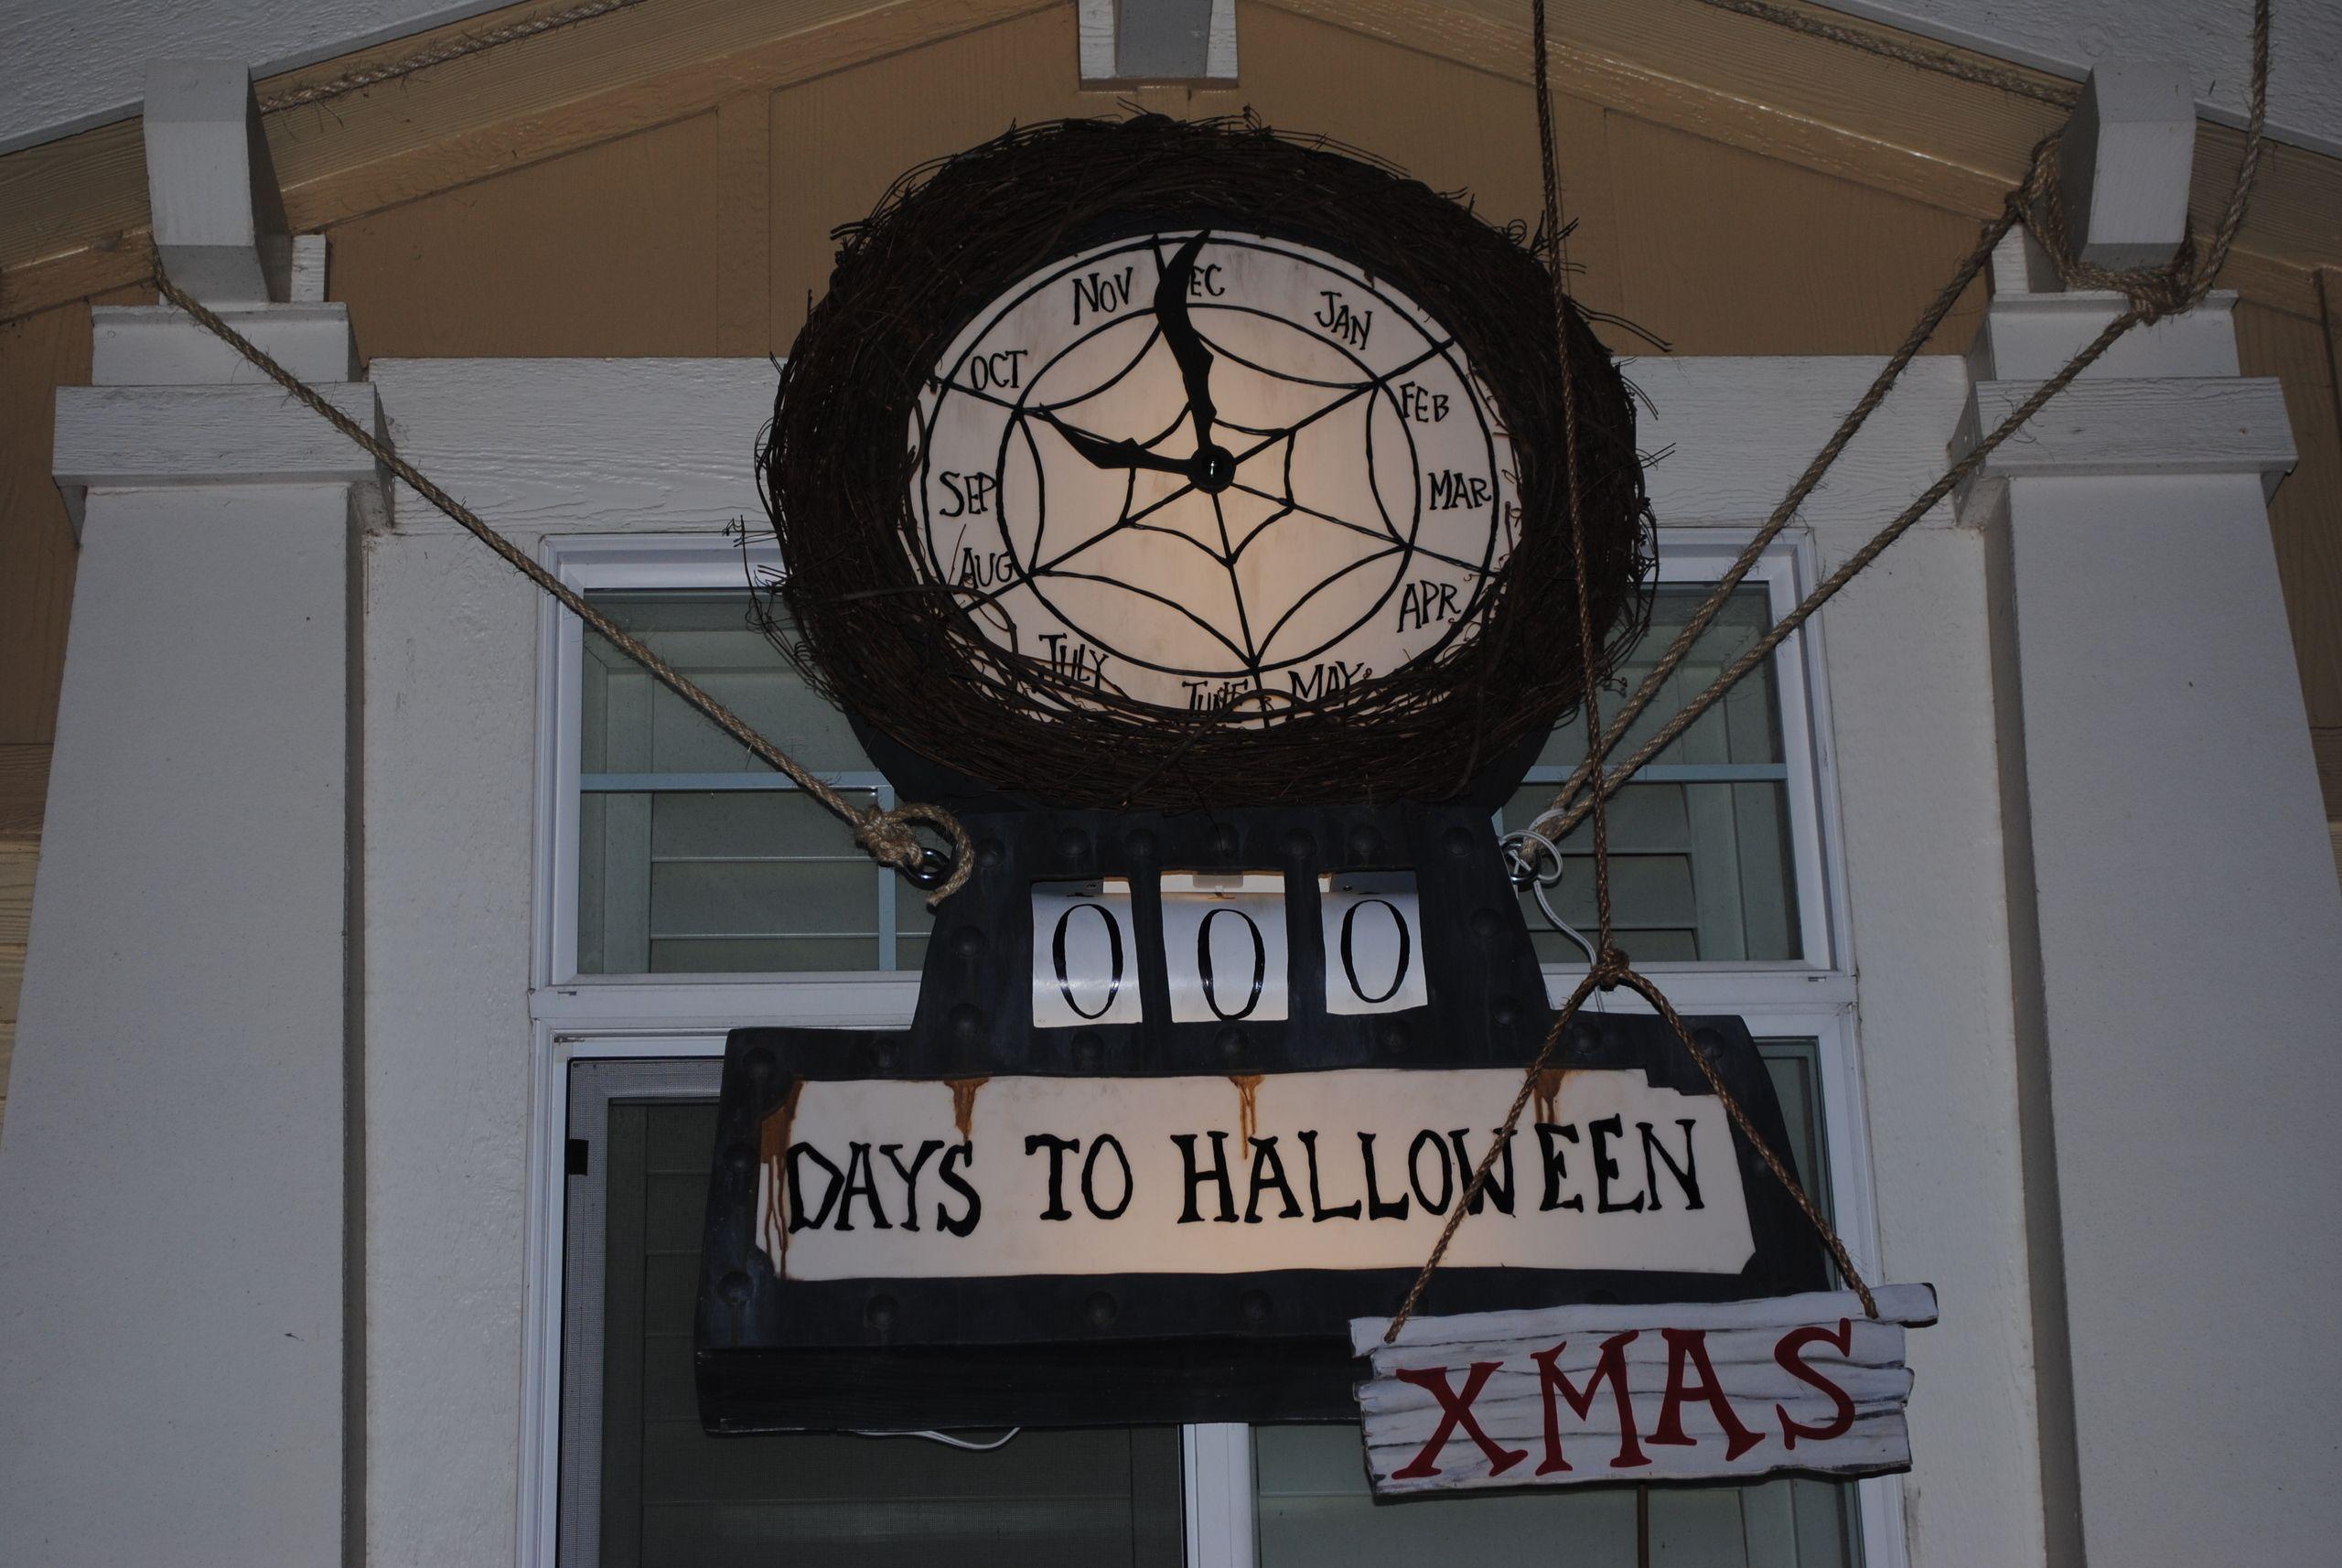 NBC Clock Halloween countdown sign, Halloween countdown